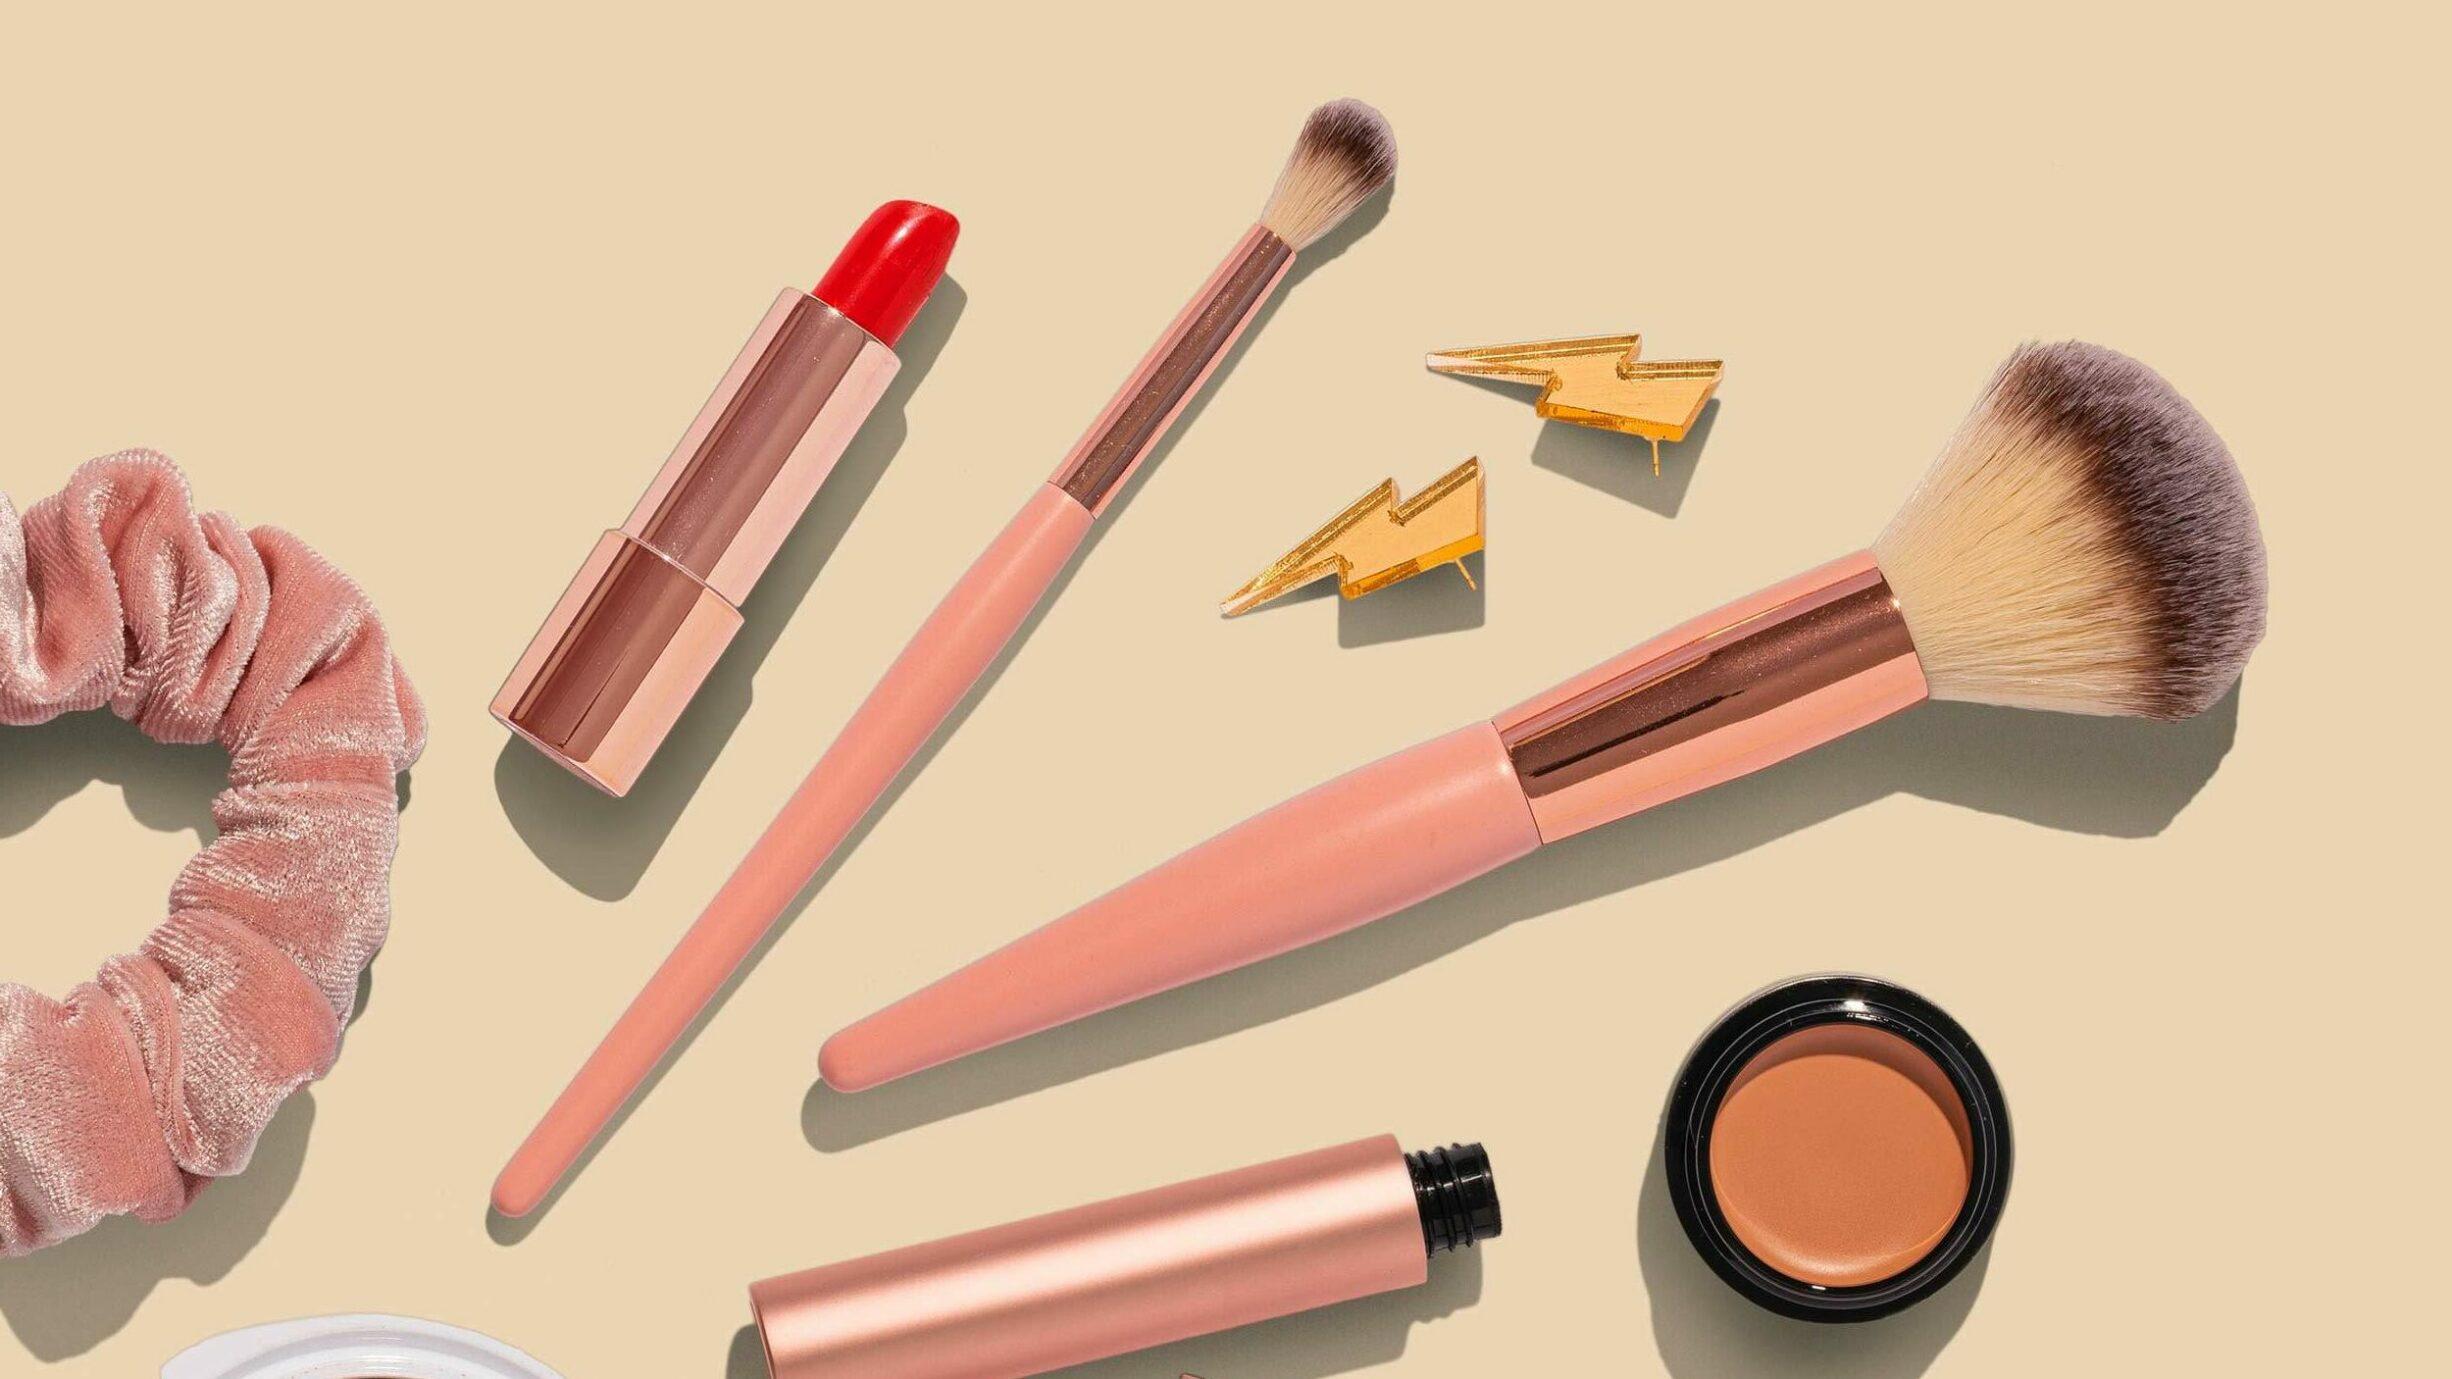 assortment of make-up